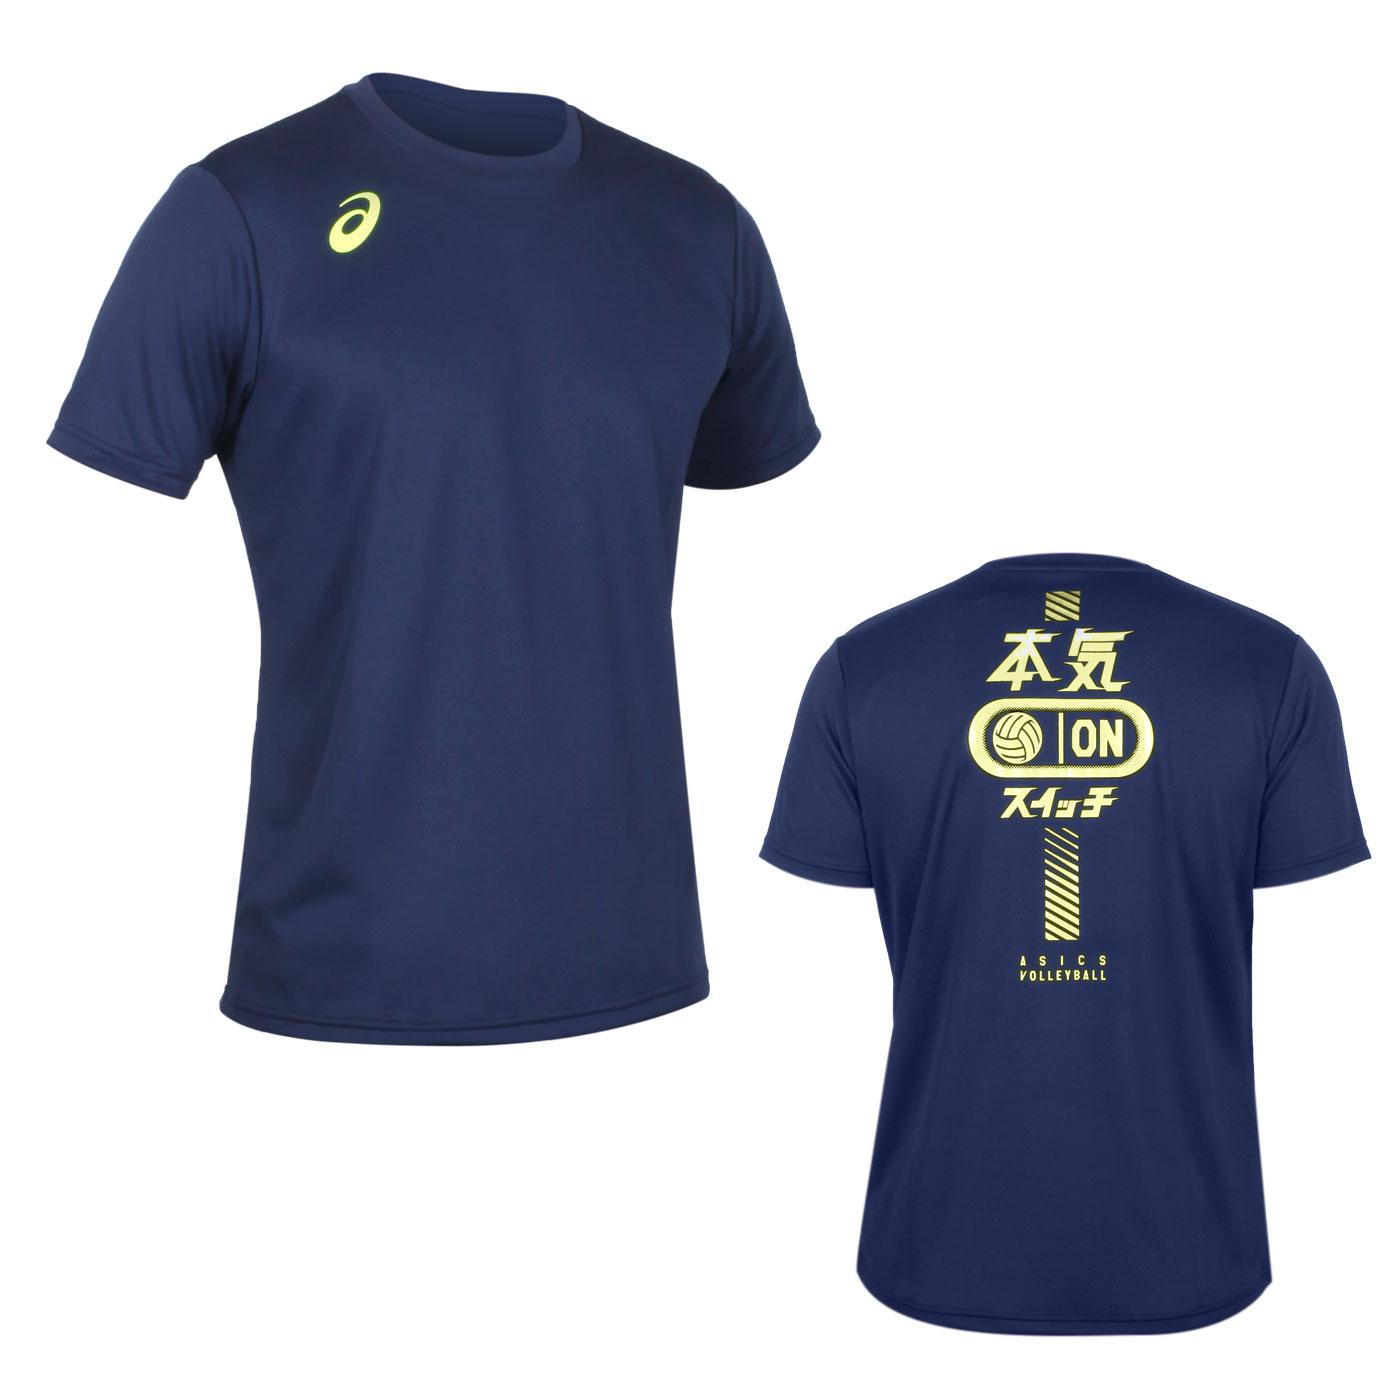 ASICS 男款排球短袖T恤 2051A253-001 - 丈青螢光黃